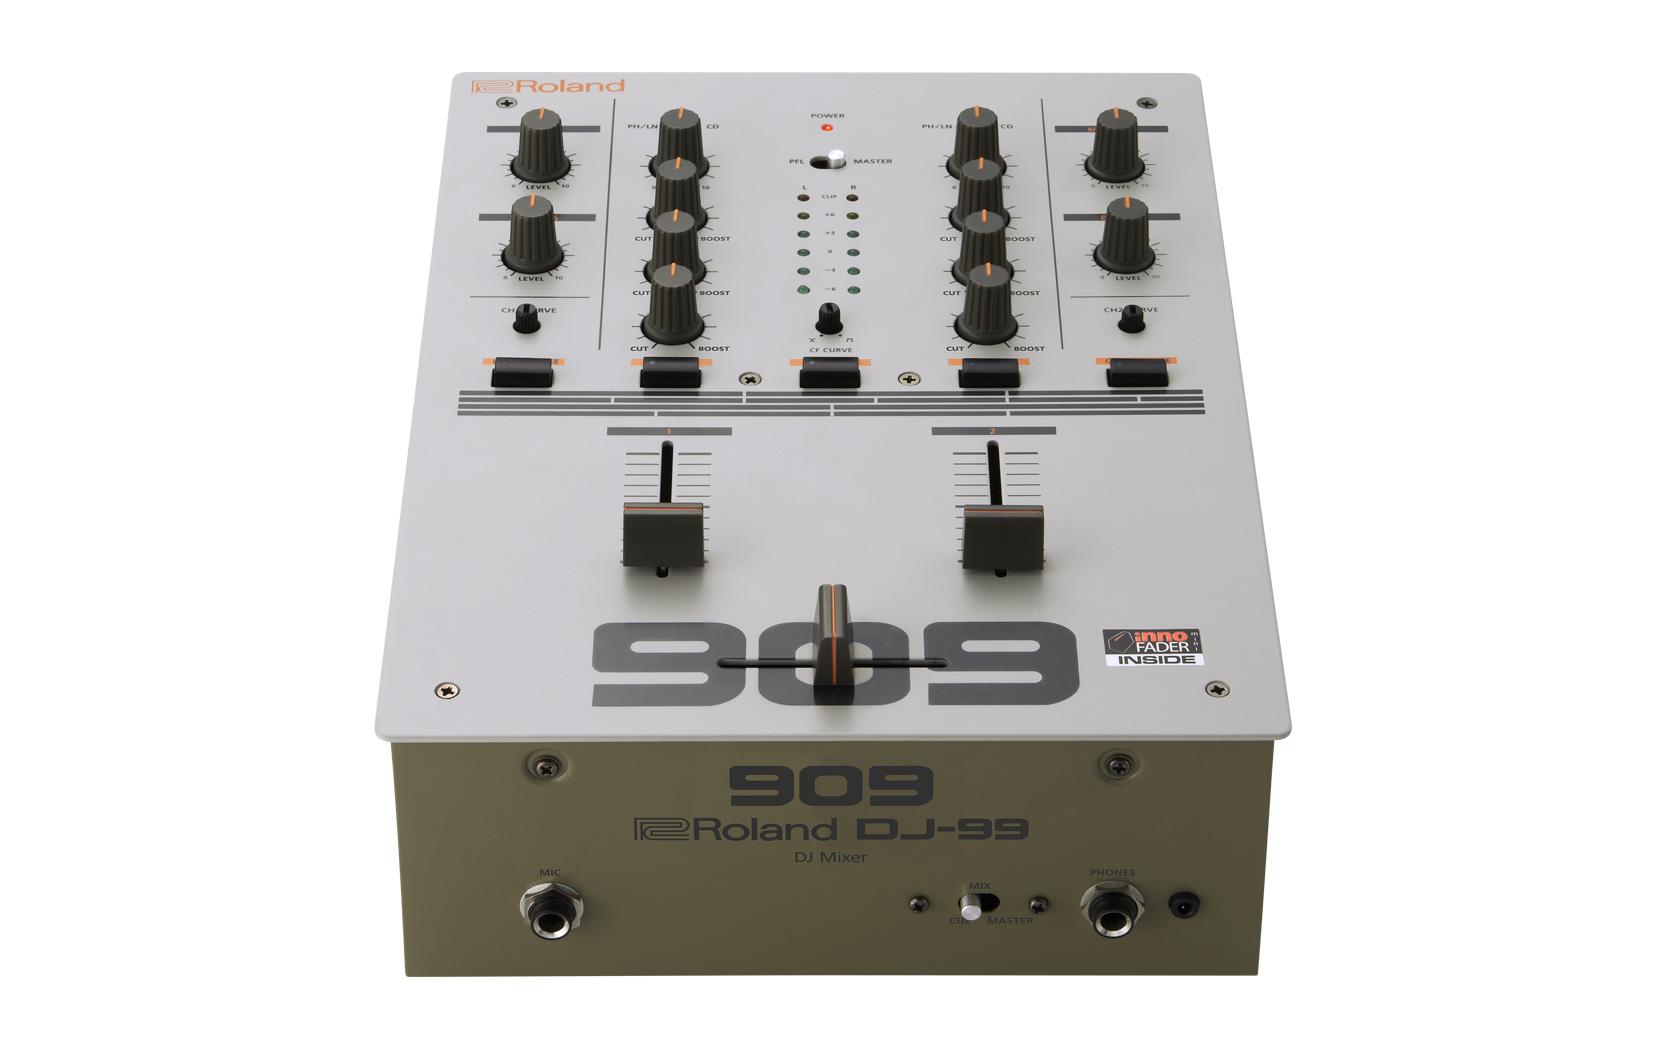 DJ-99